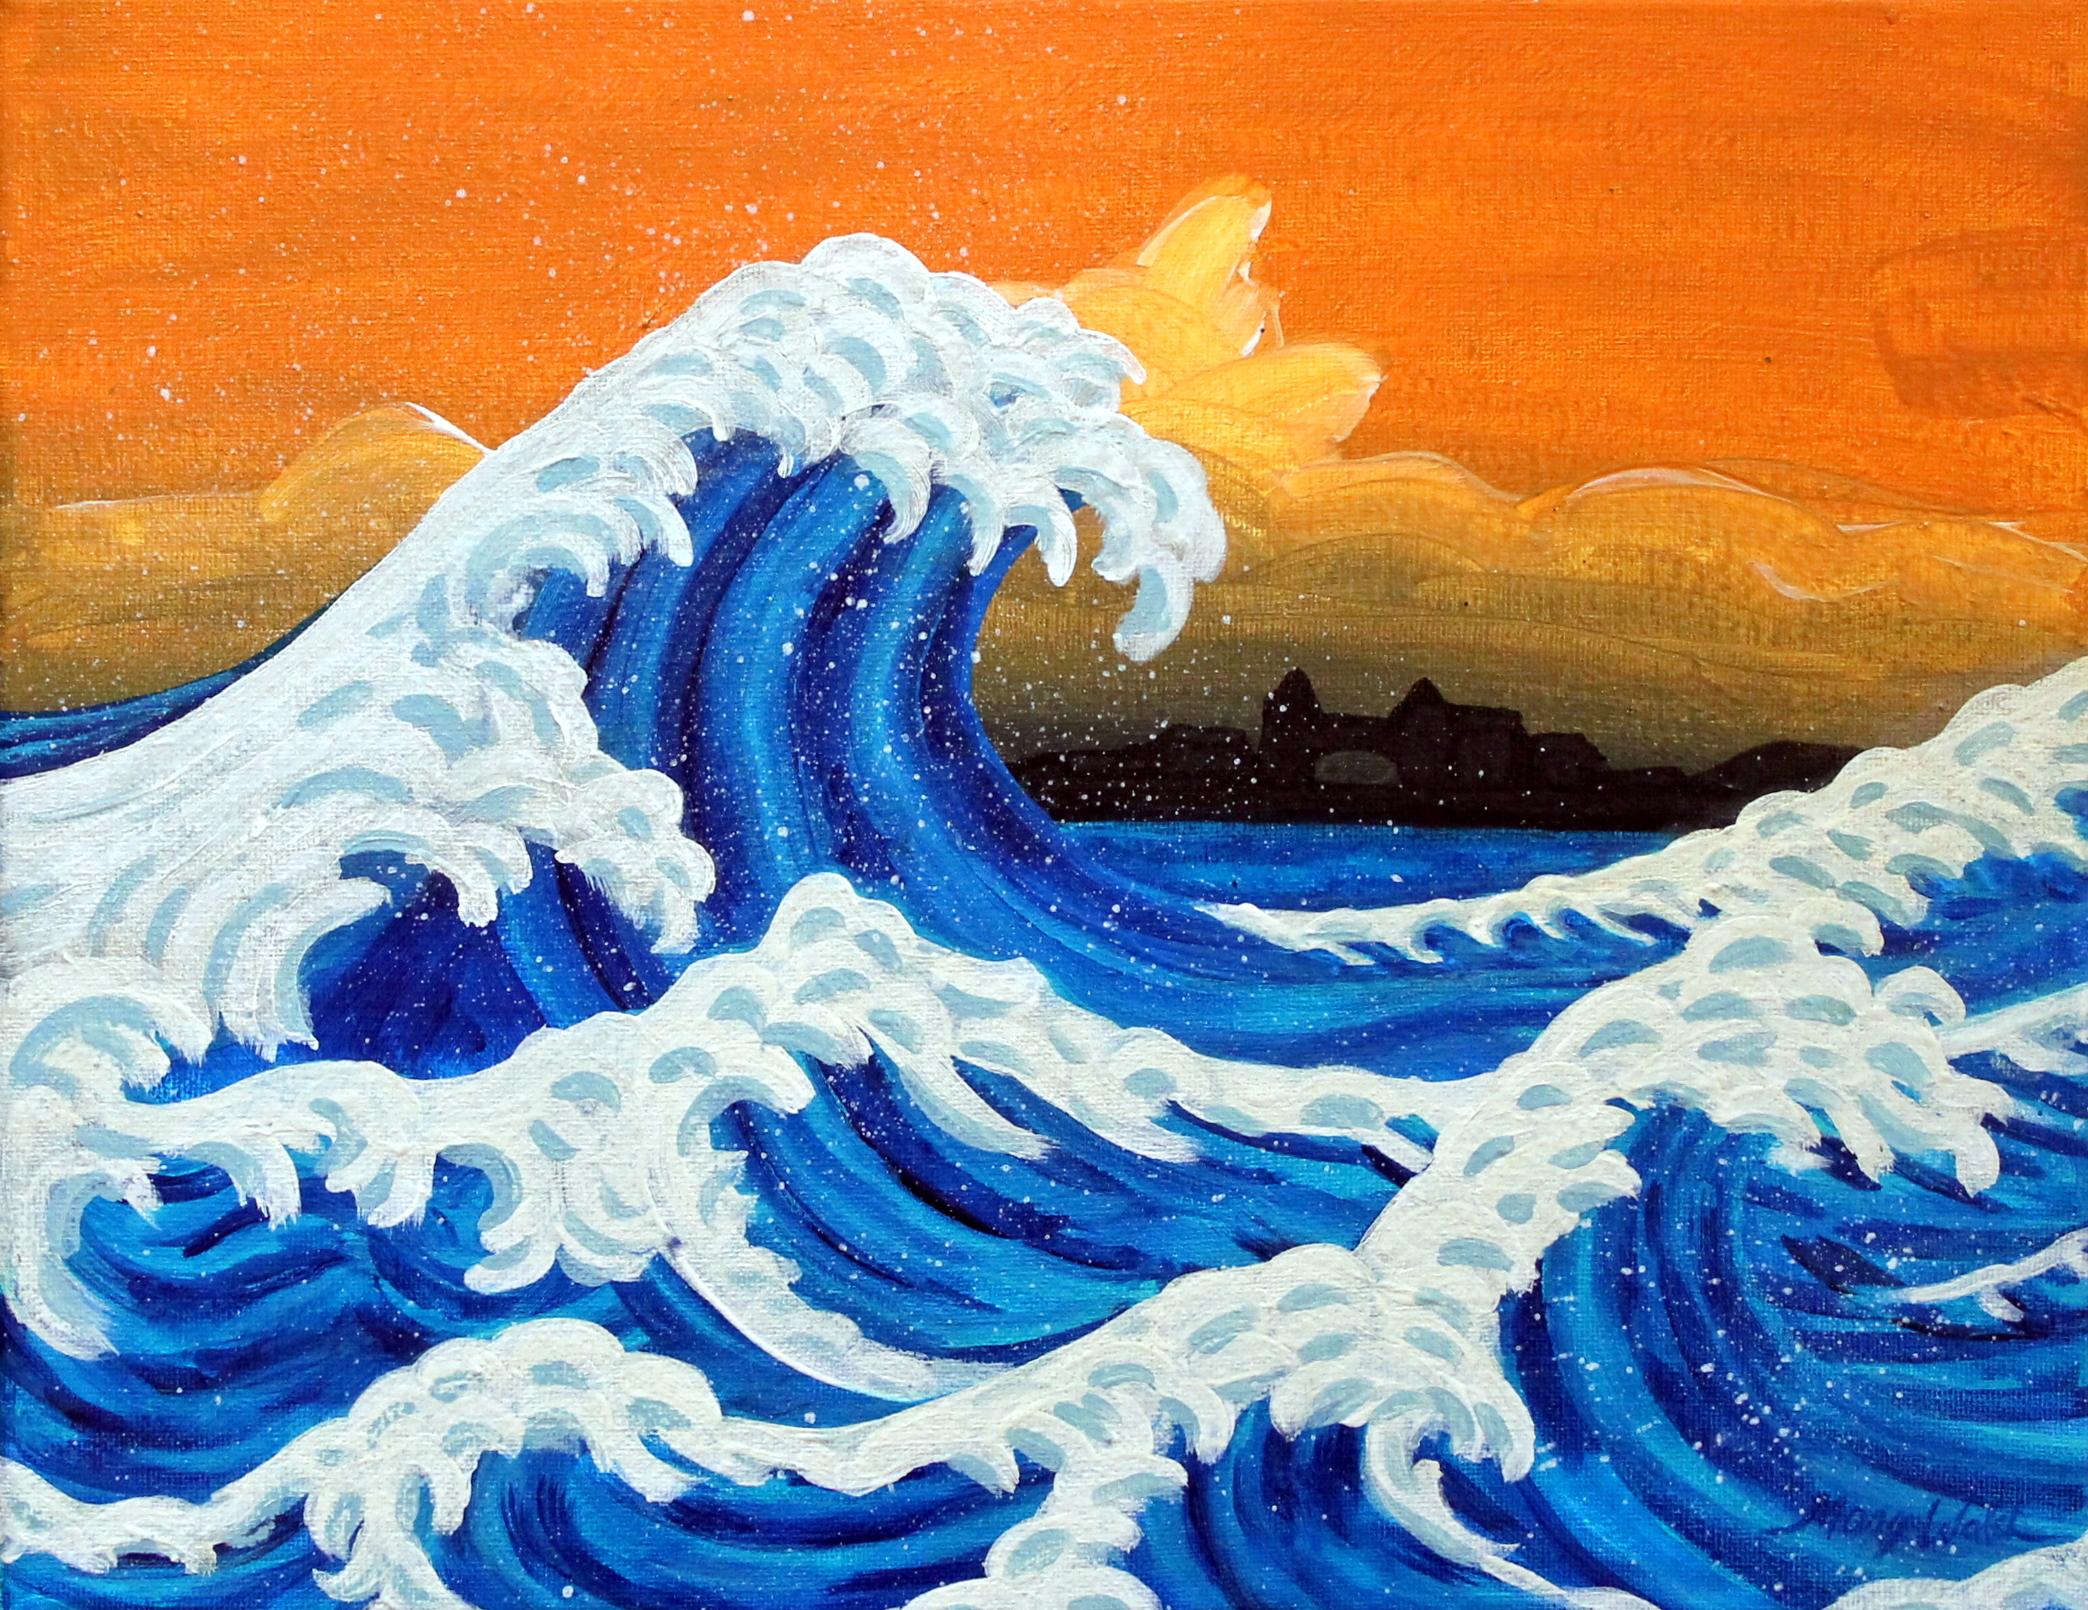 making waves be creative